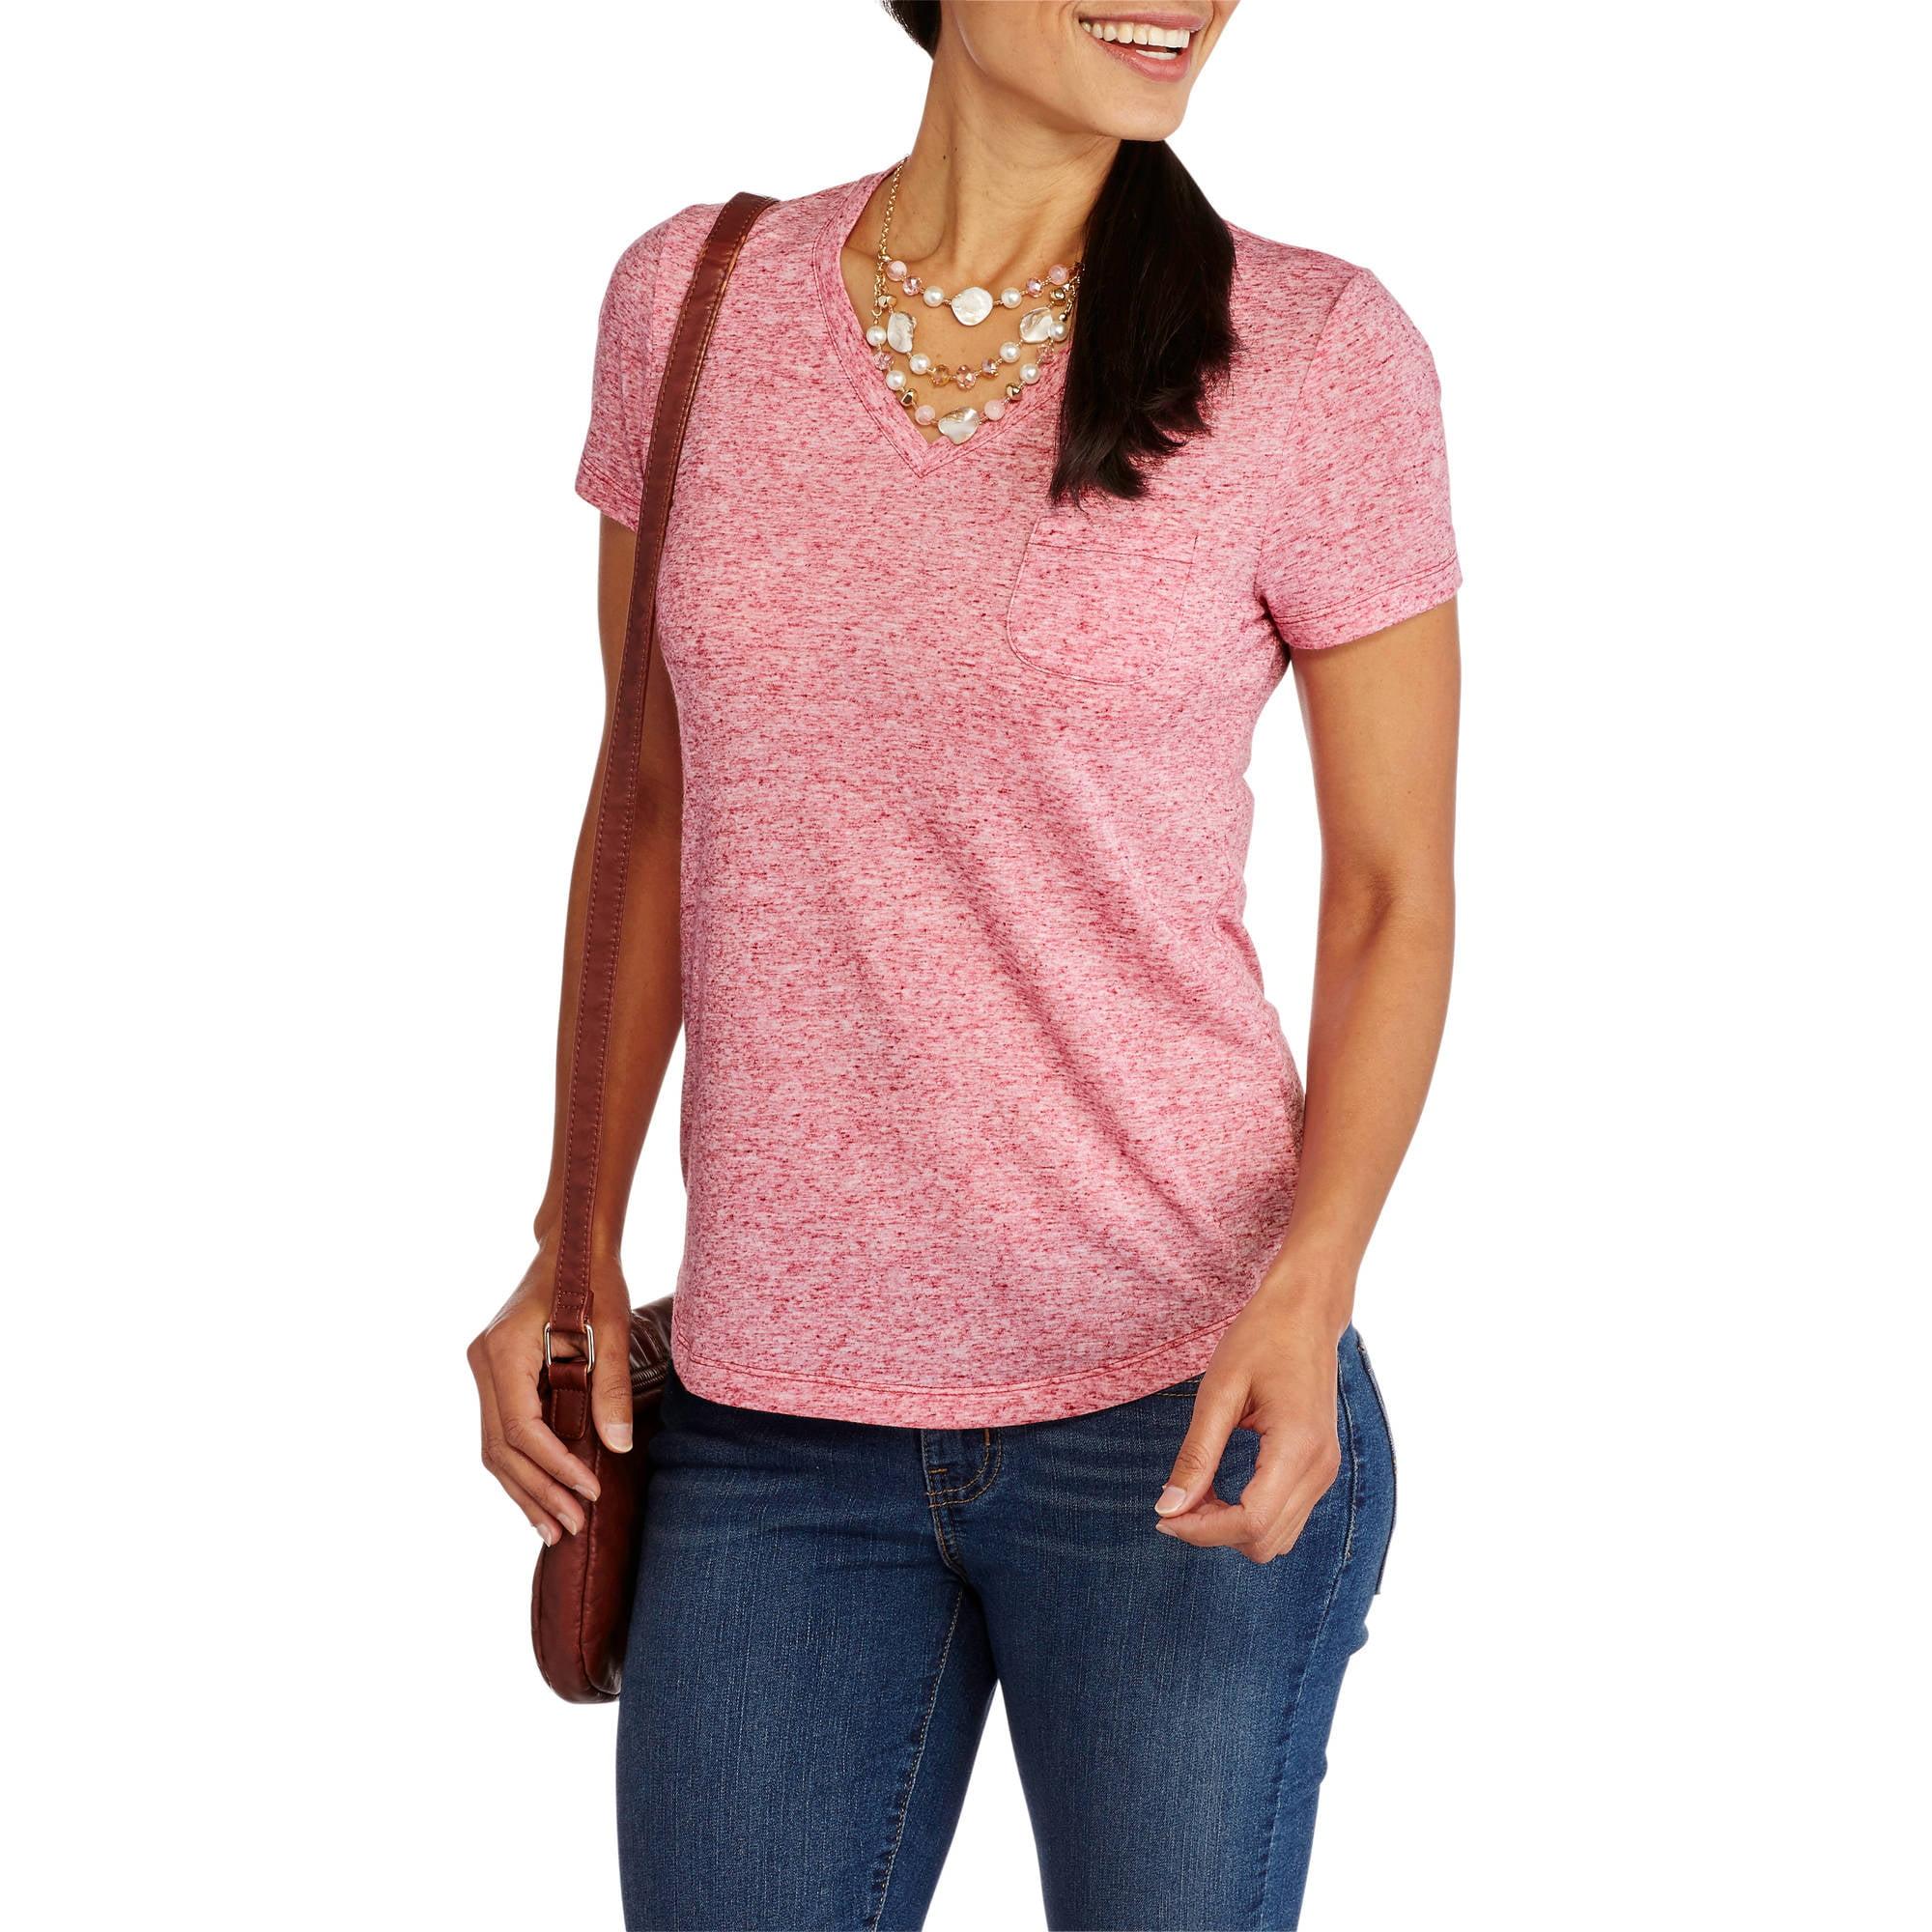 Faded Glory Women's Linen Blend Relaxed fit Short Sleeve V-Neck Pocket T-Shirt